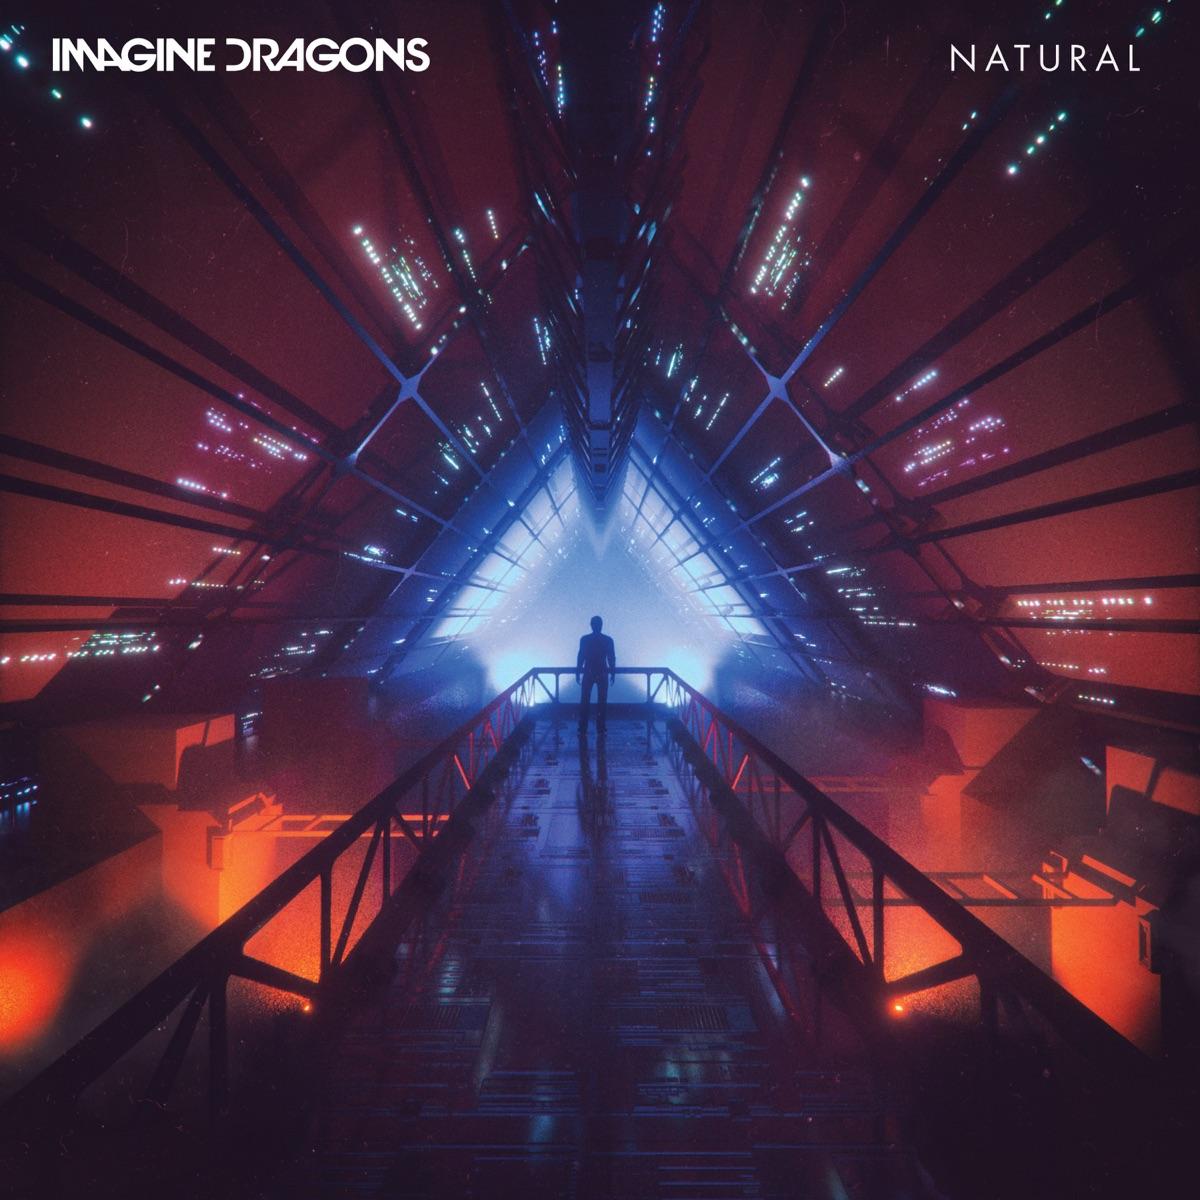 Natural - Single Imagine Dragons CD cover